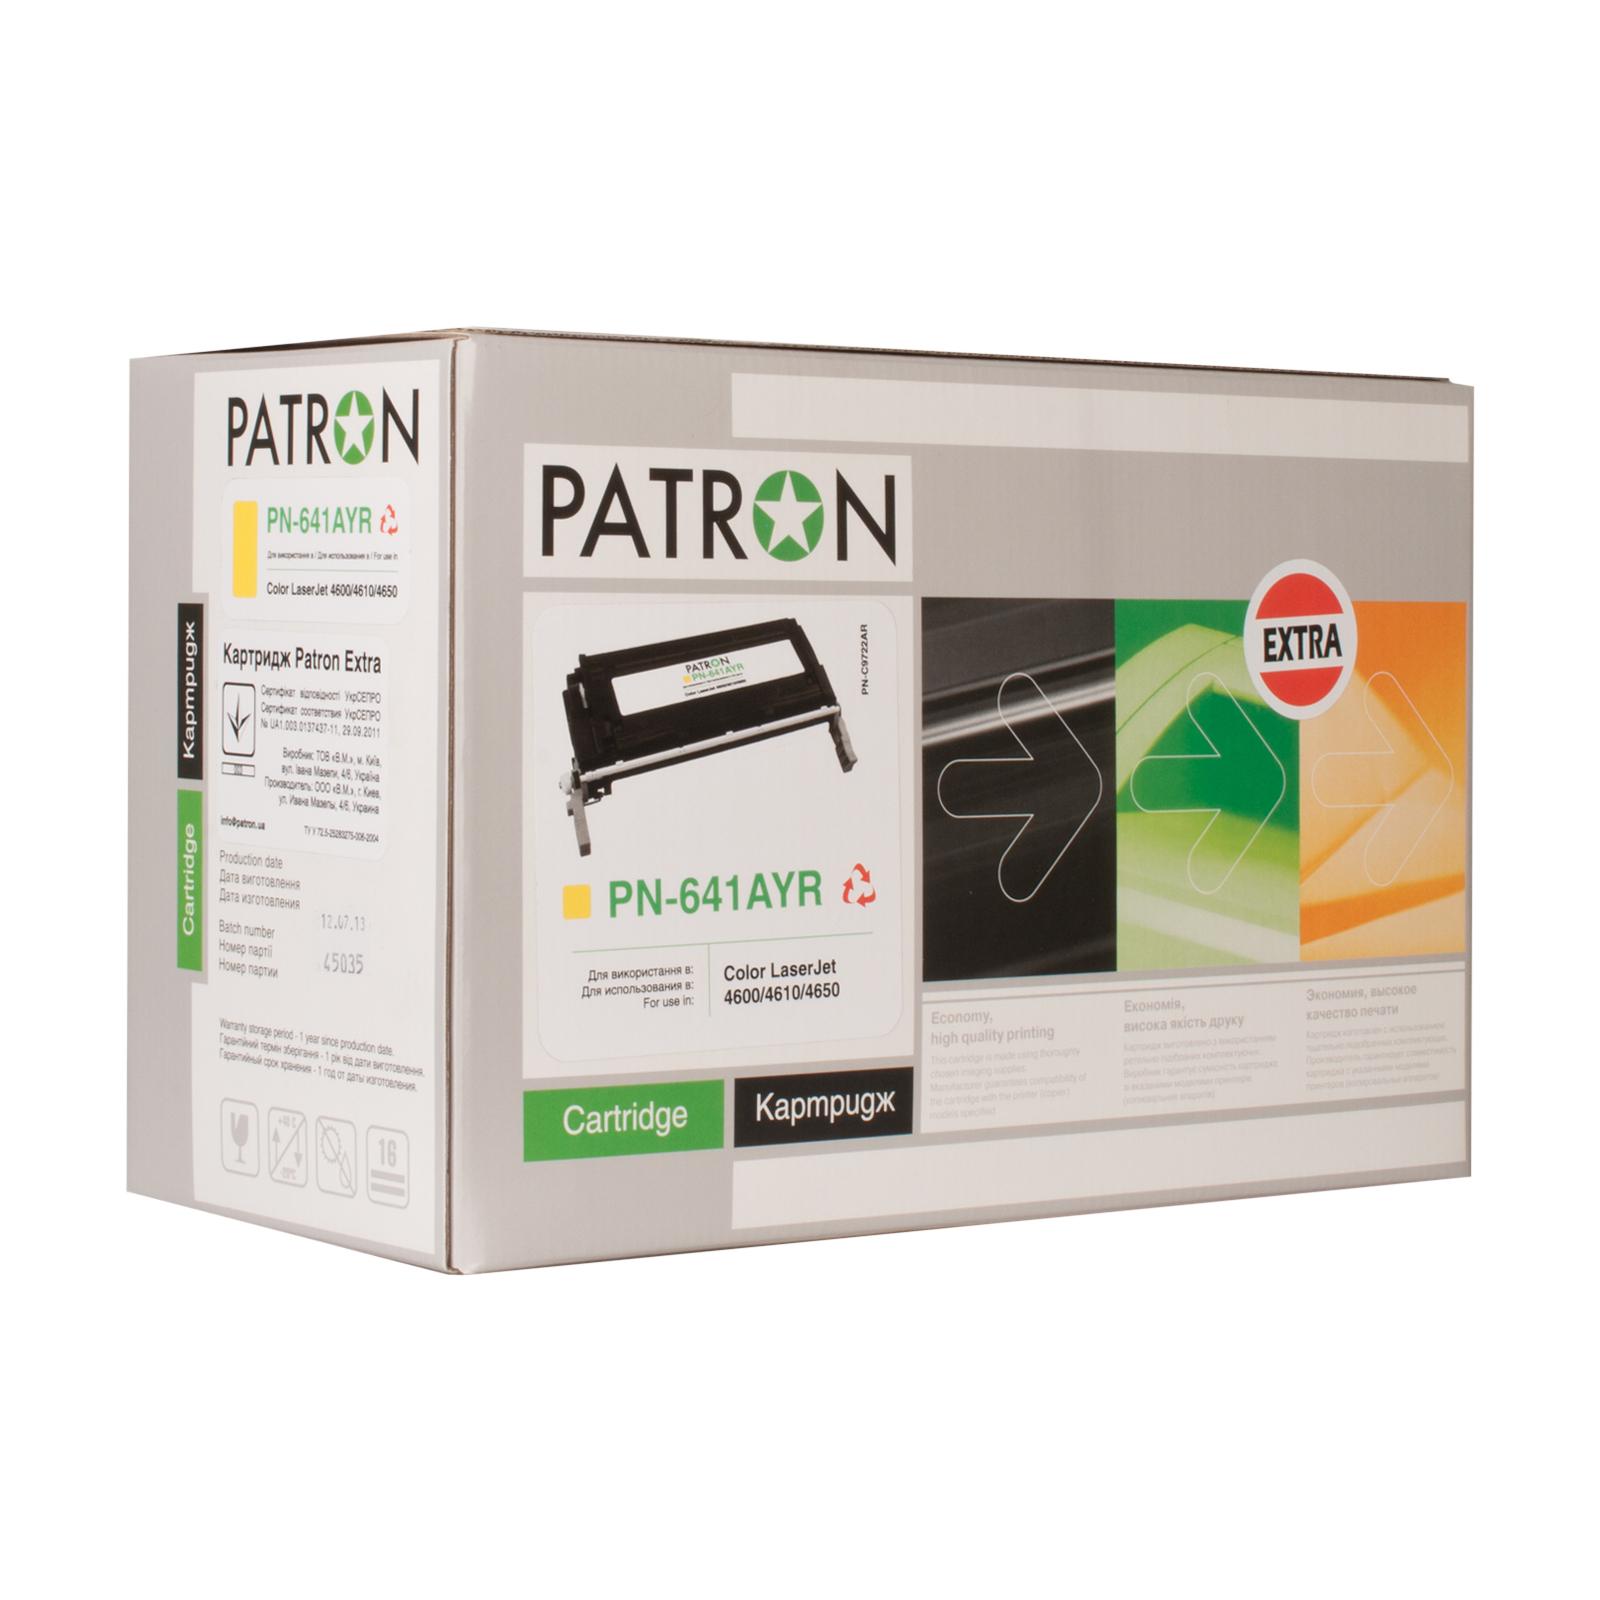 Картридж PATRON HP CLJ 4600 /C9722A (PN-641AYR) YELLOW Extra (CT-HP-C9722A-Y-PN-R) изображение 7